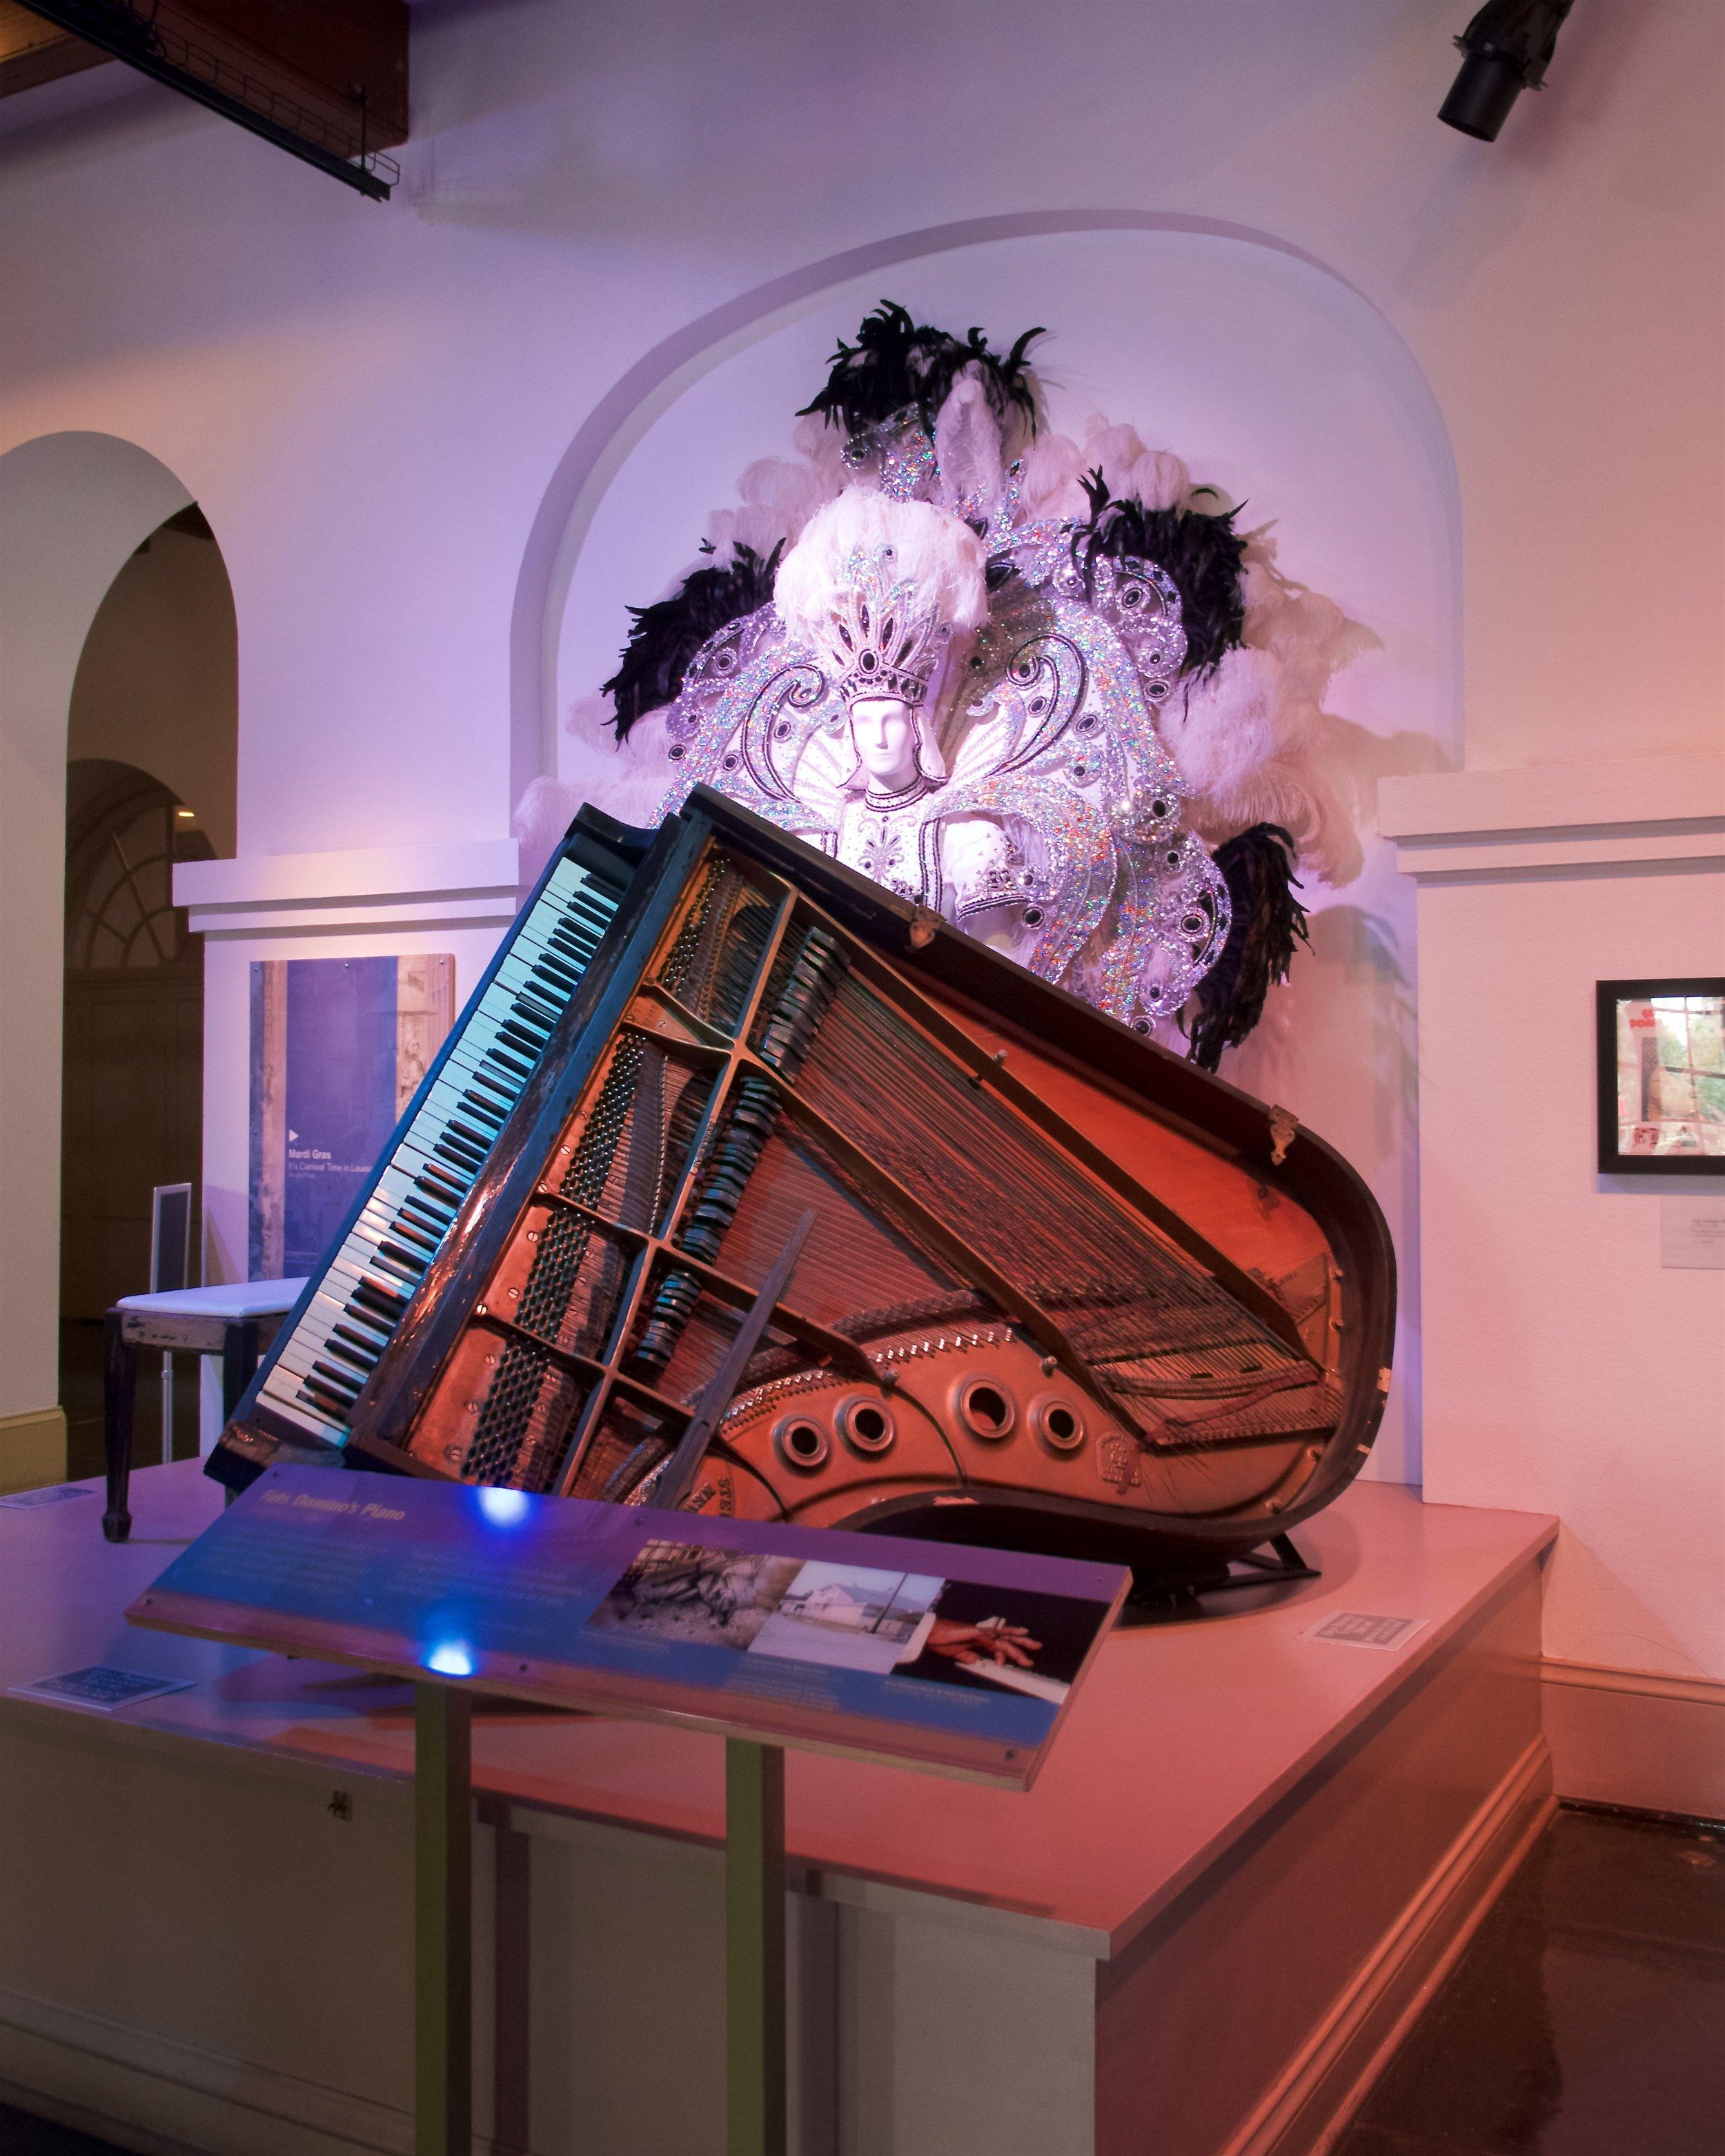 Fats Domino's piano after Katrina damage